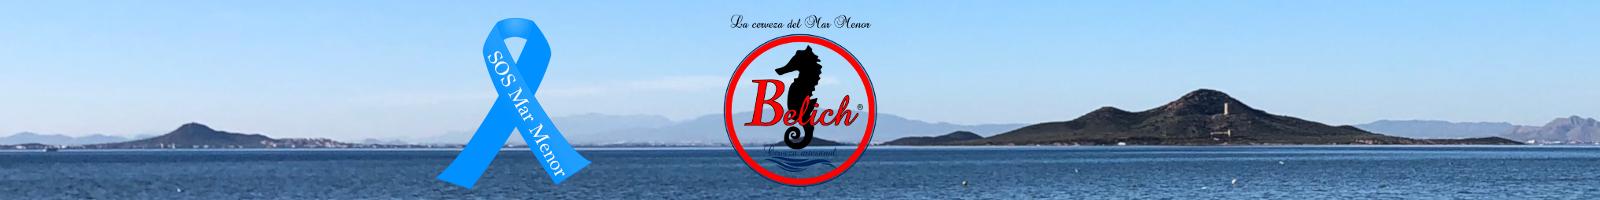 Cervezas Artesanas Belich